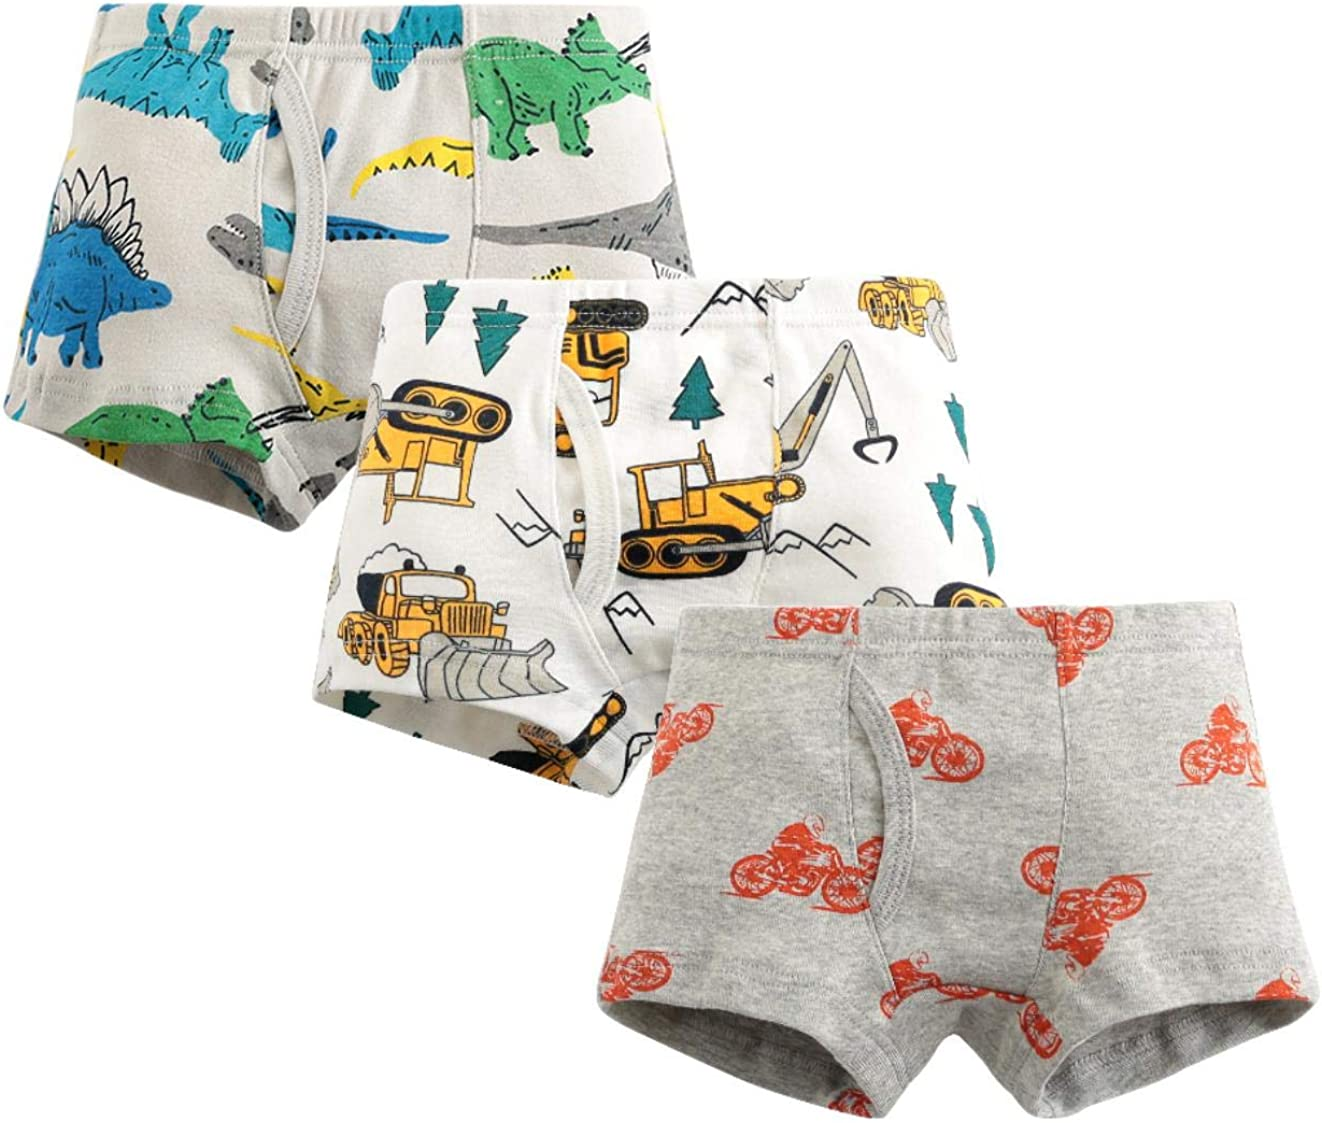 MIMY Boys Soft Cotton Boxer Briefs Toddler Kids Baby Underwear Dinosaur Truck Training Panty 3 Pack 3-10Y White